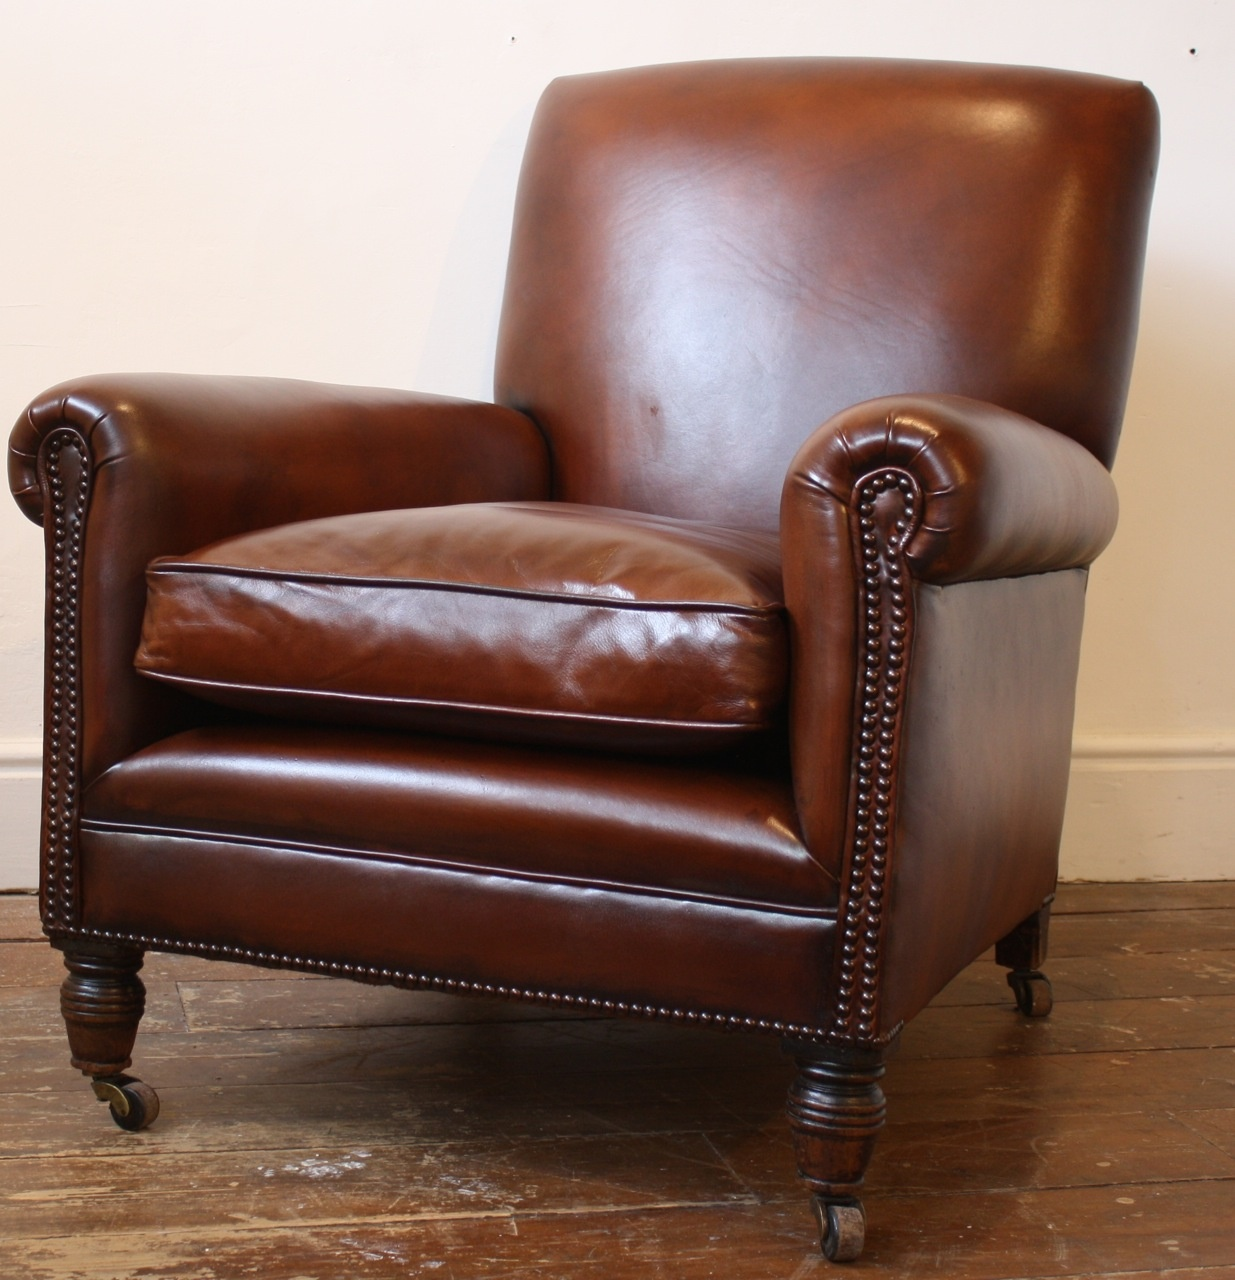 Reupholster Old Leather Sofa Digitalstudioswebcom